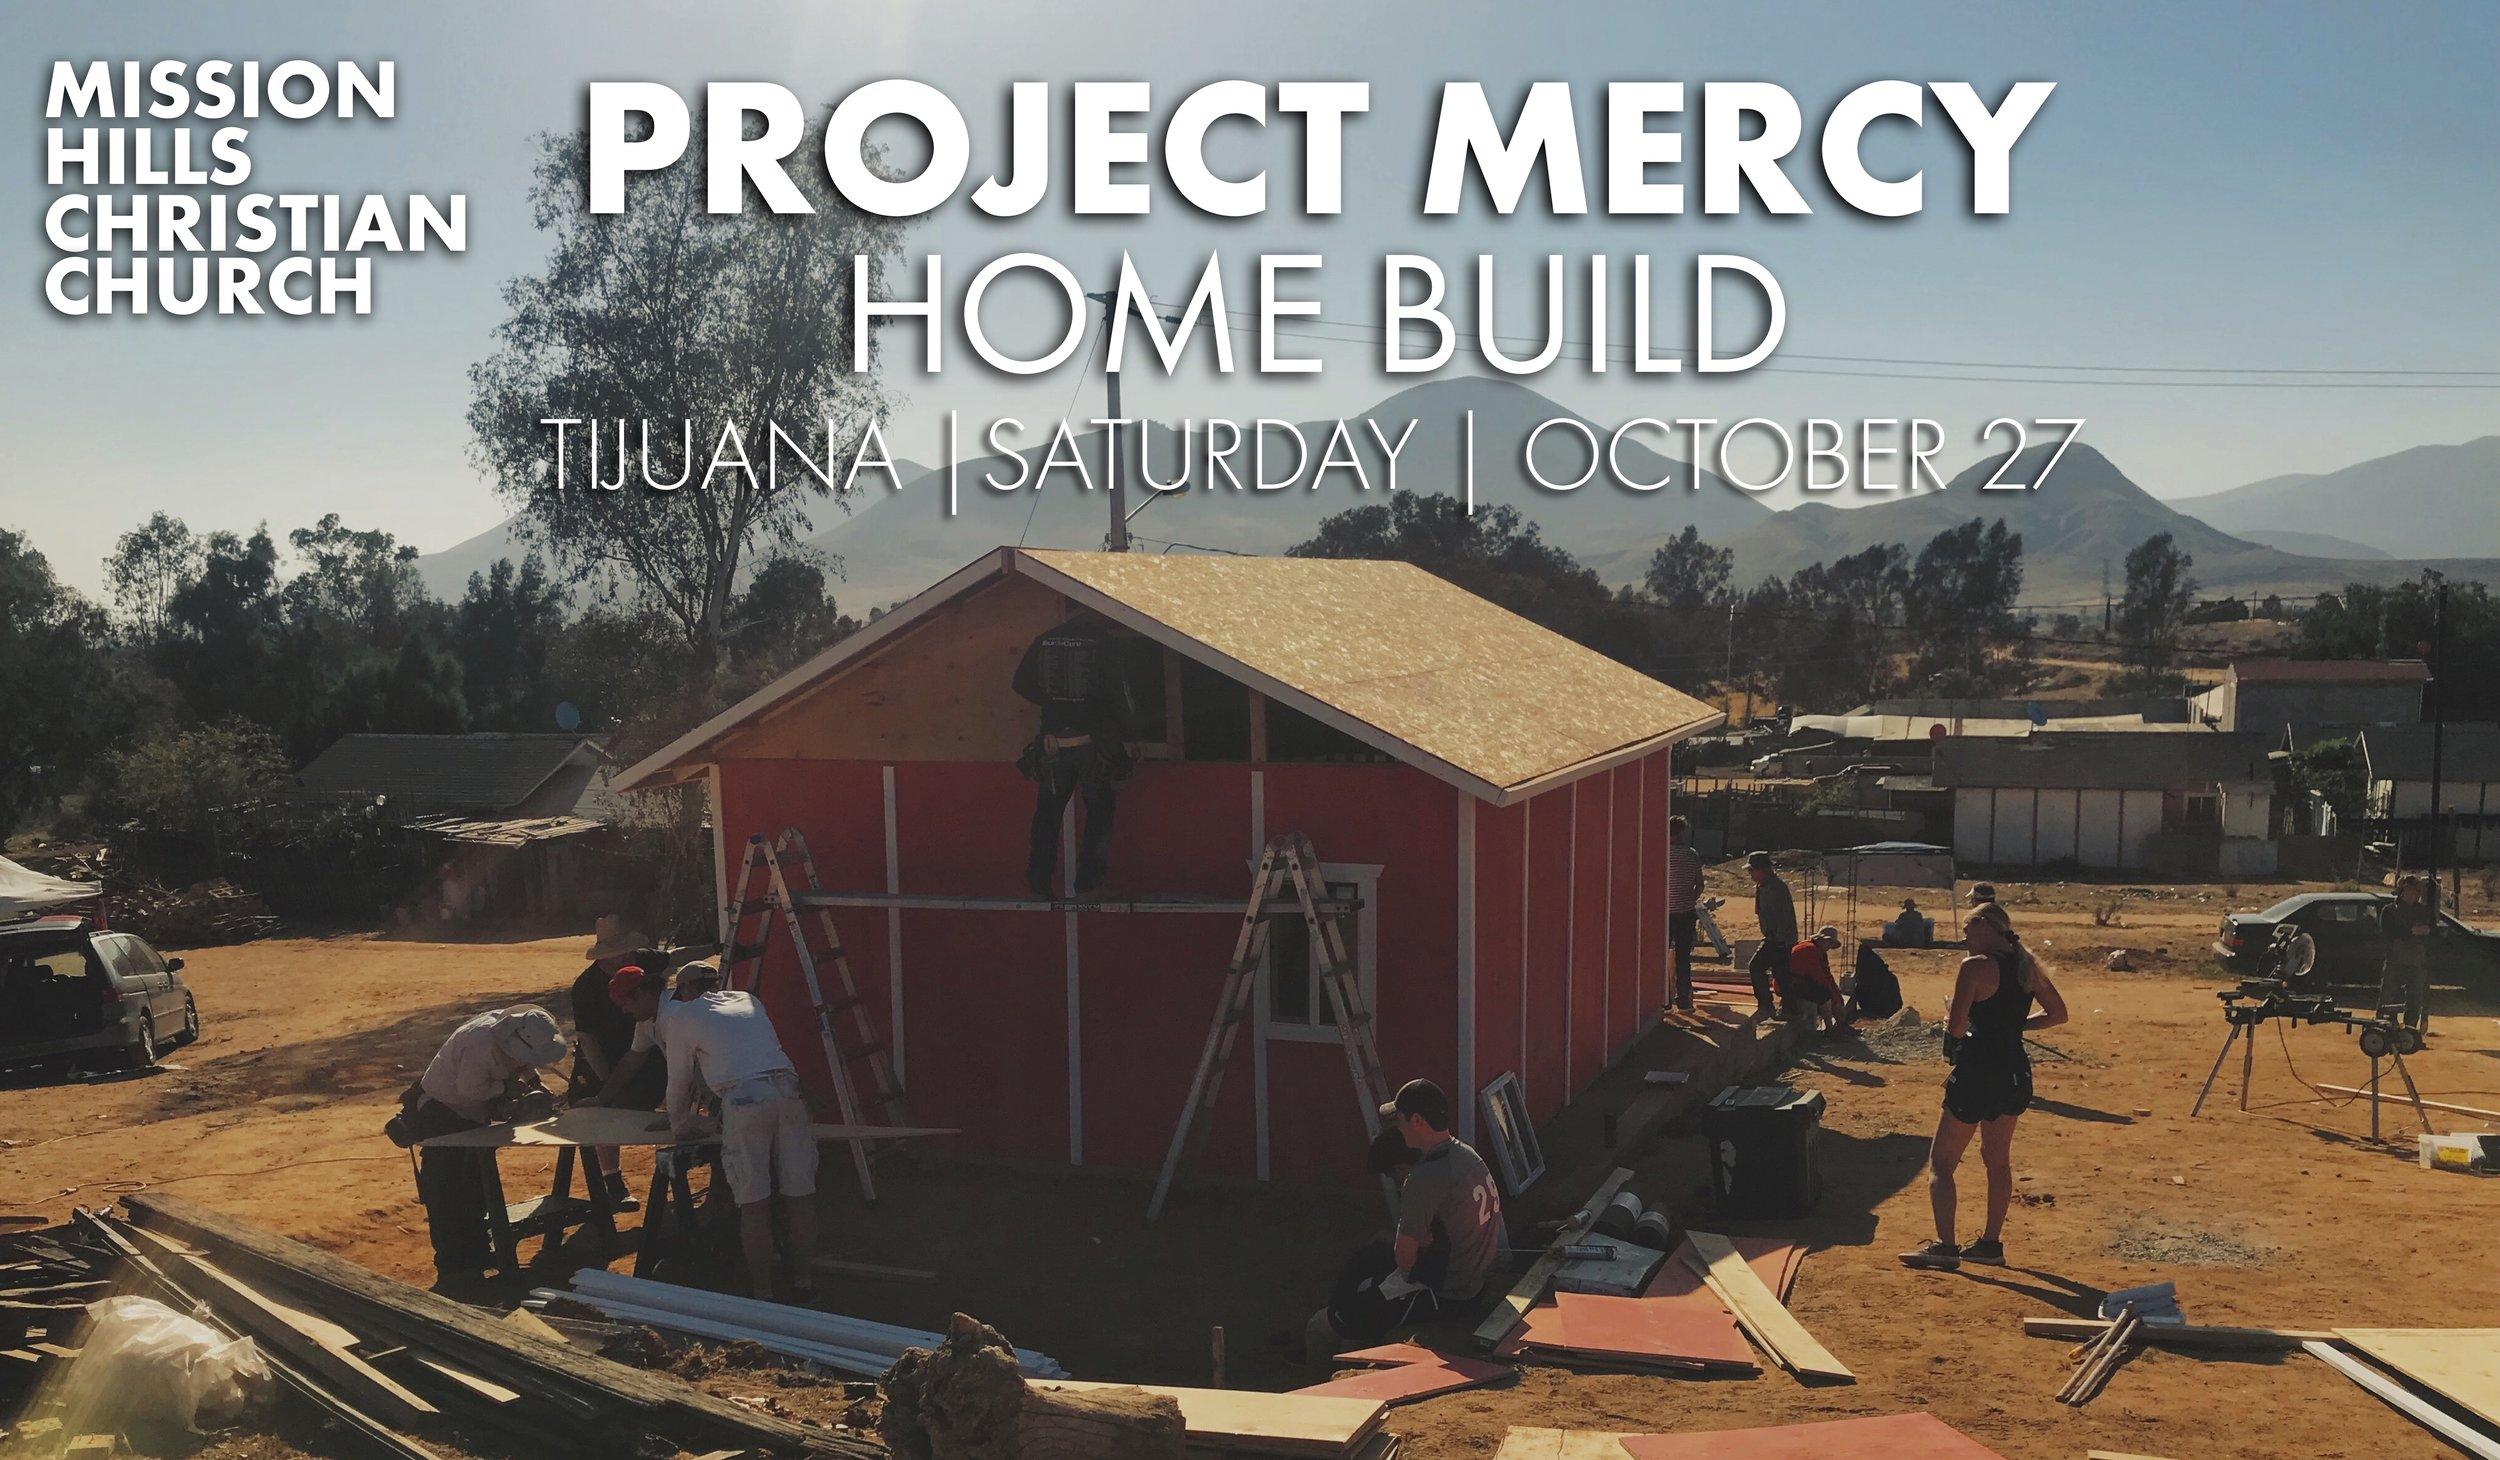 TIJUANA-HOME-BUILD-MISSION-HILLS-CHRISTIAN-CHURCH-LOS-ANGELES-JPEG-PHOTO.jpg